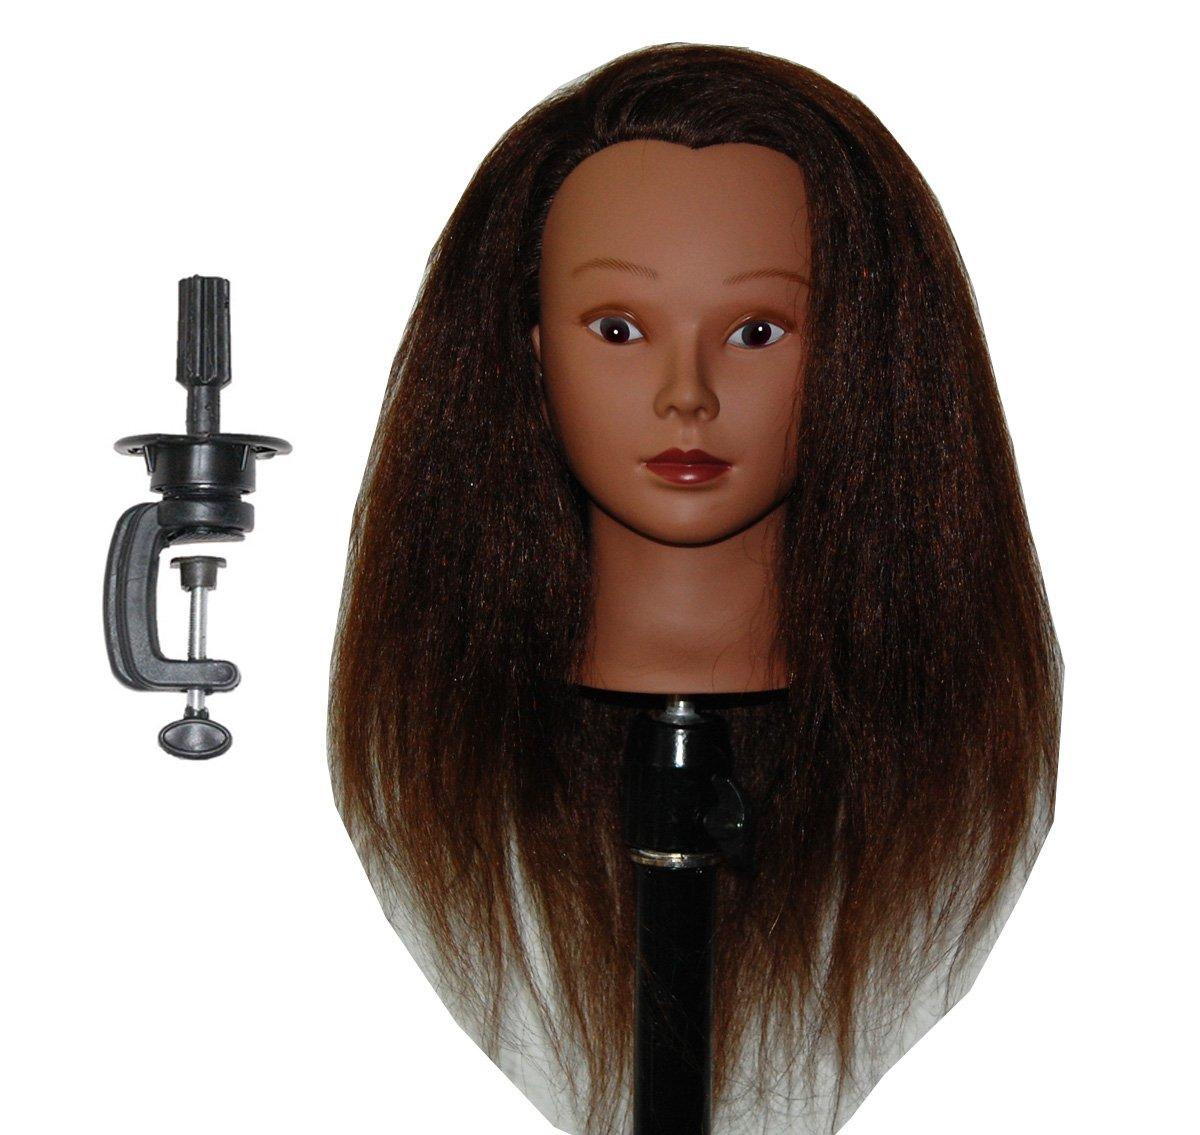 Ethnic Afro Coarse 100% Real Hair Mannequin Head Hairdresser Training Head Manikin Cosmetology Doll Head (HAZEL+C)